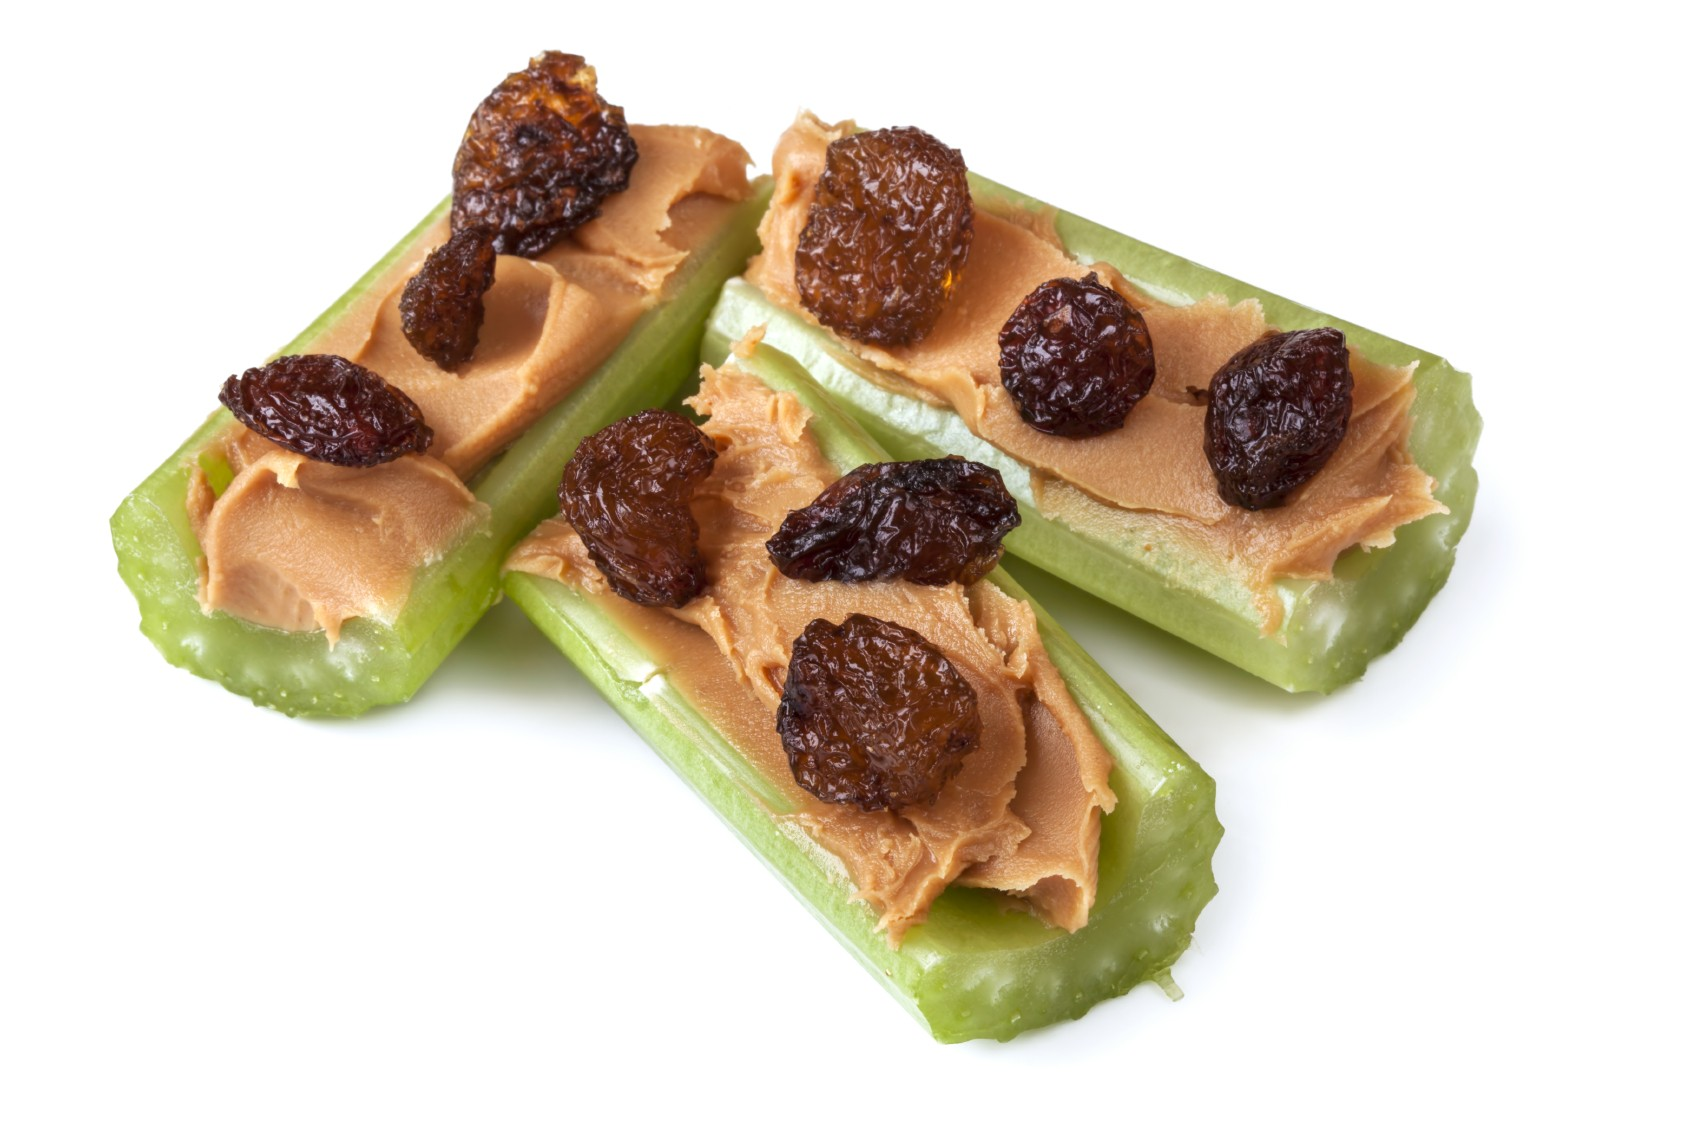 Ants on a Log: Celery Peanut Butter and Raisins